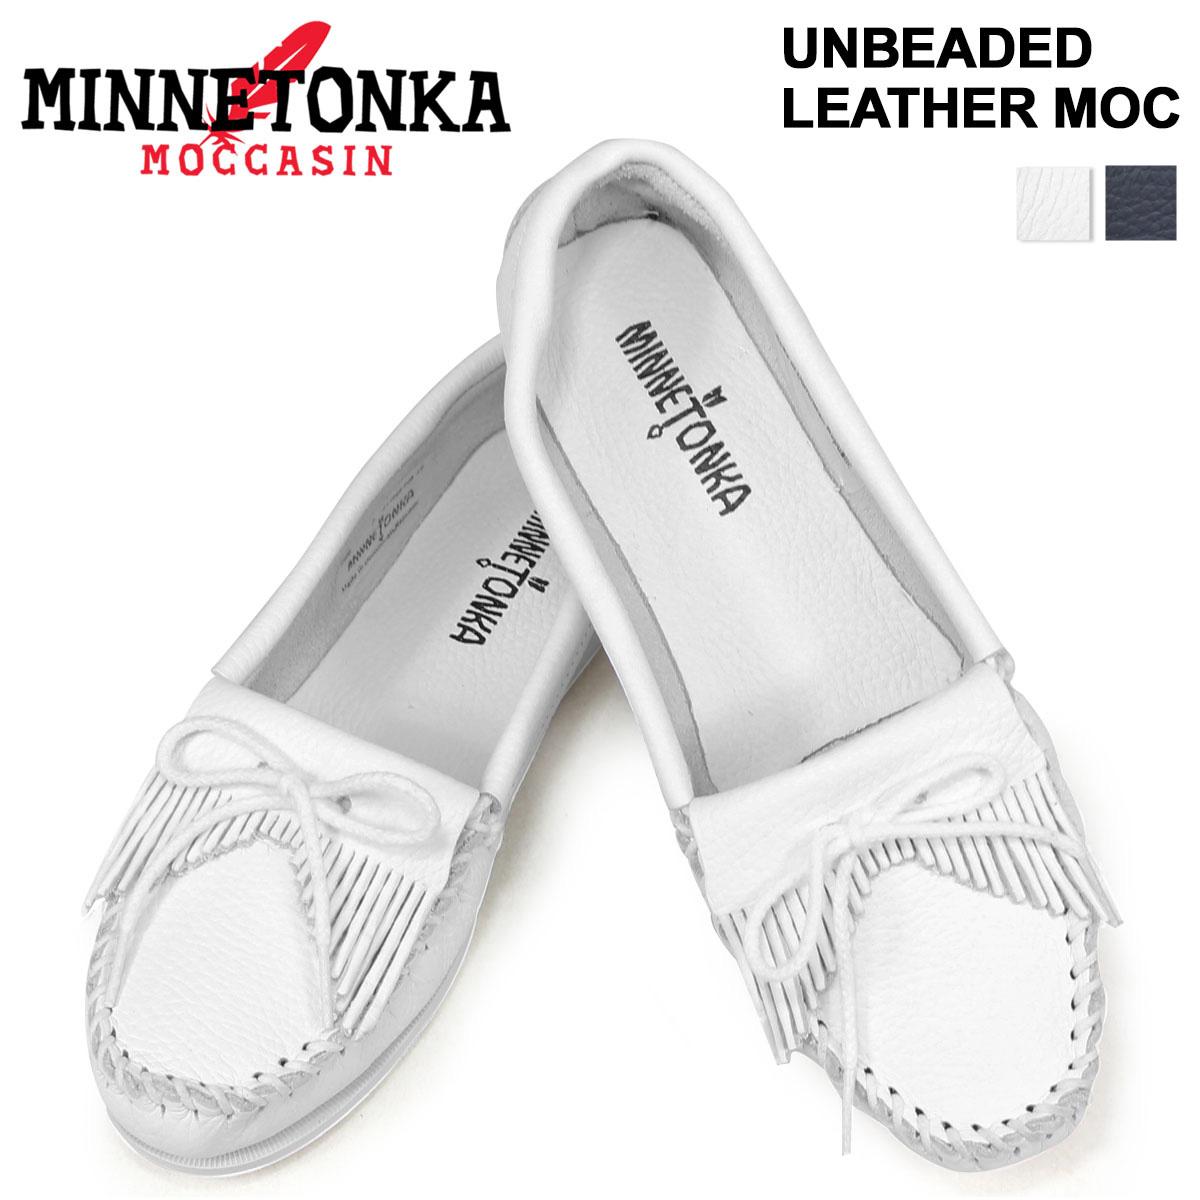 cf492831df32 MINNETONKA Minnetonka moccasins an beaded leather UNBEADED LEATHER MOC women